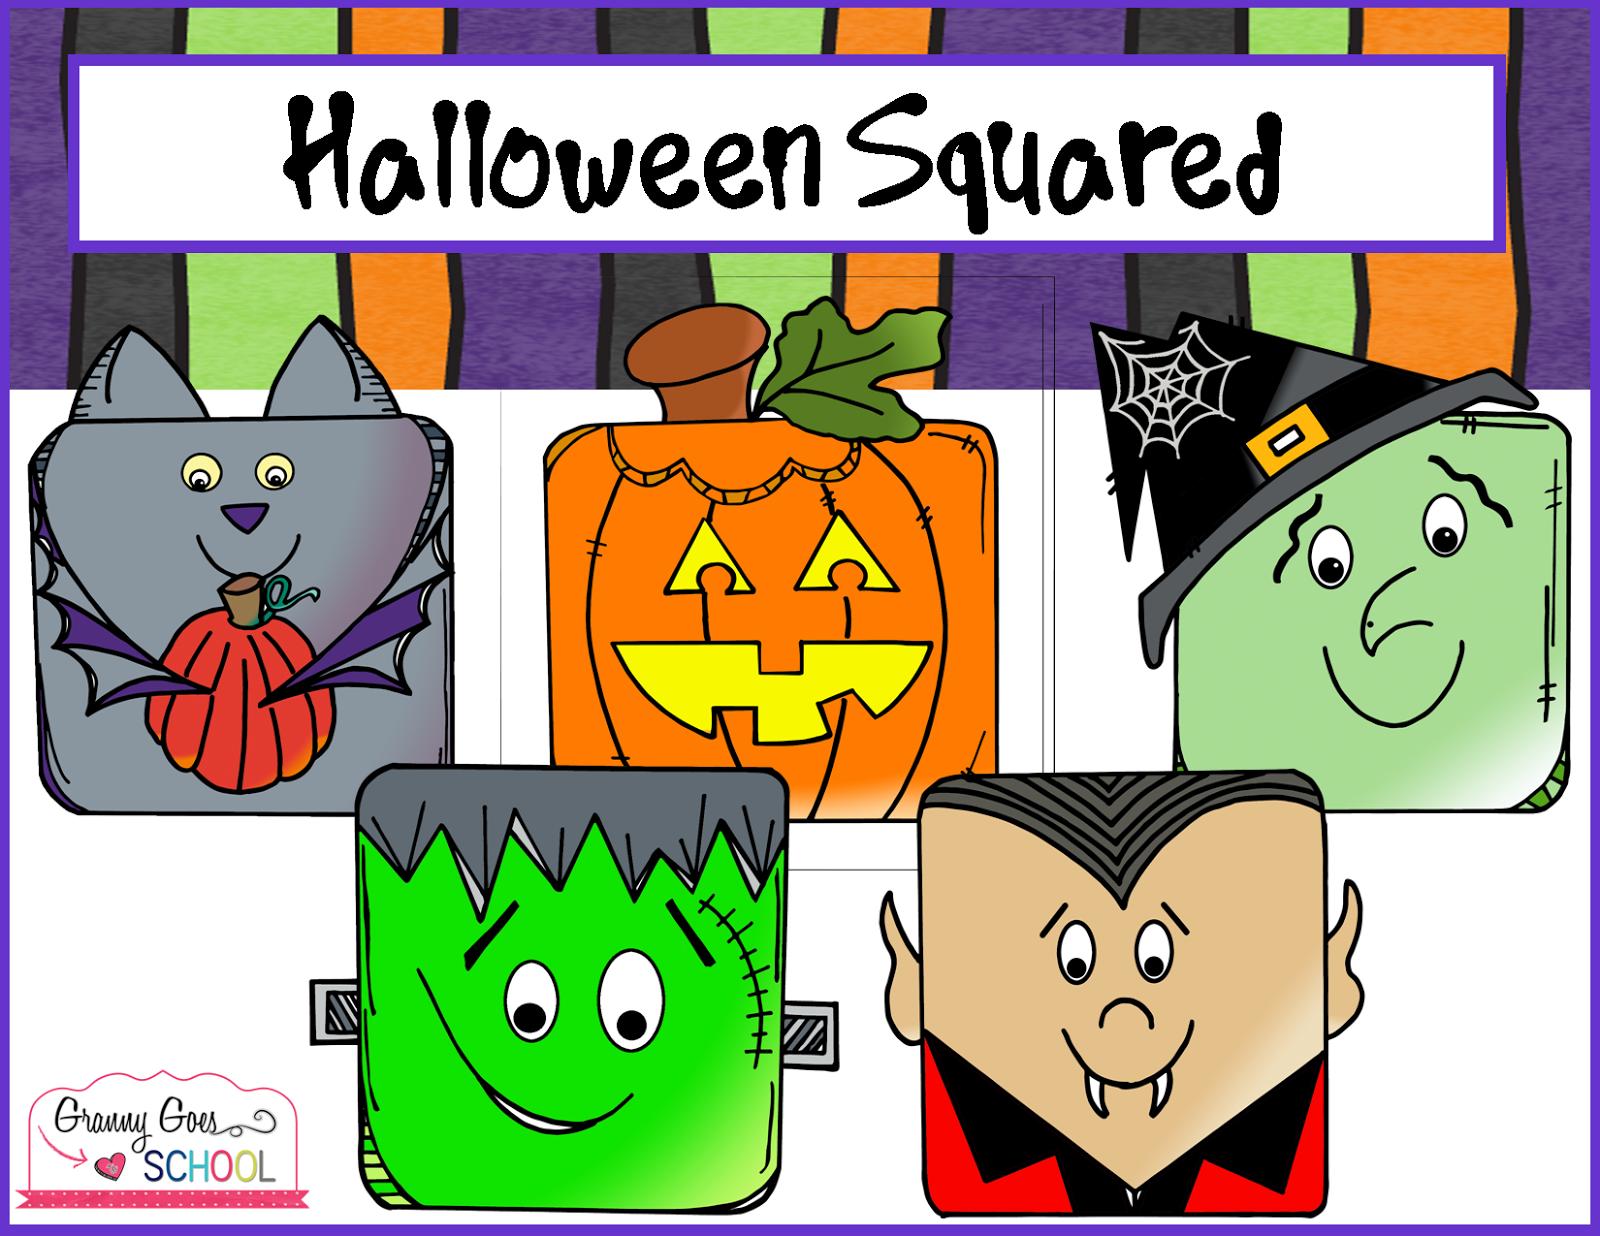 http://grannygoestoschool.blogspot.com/2014/09/halloween-blockheads-clip-art-freebie.html